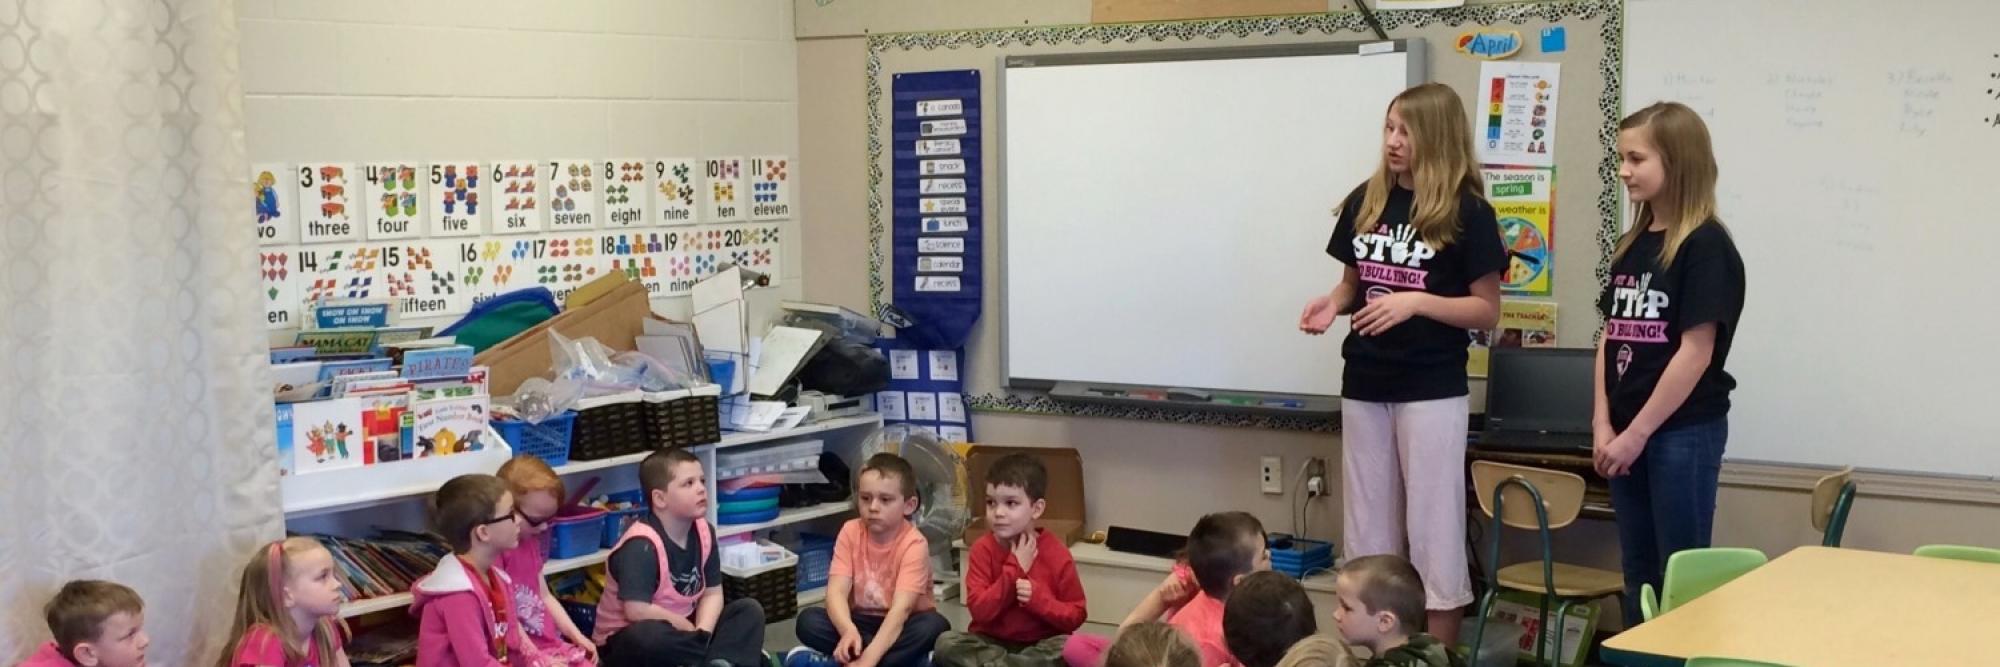 Bullying Prevention a Priority at Churchbridge School